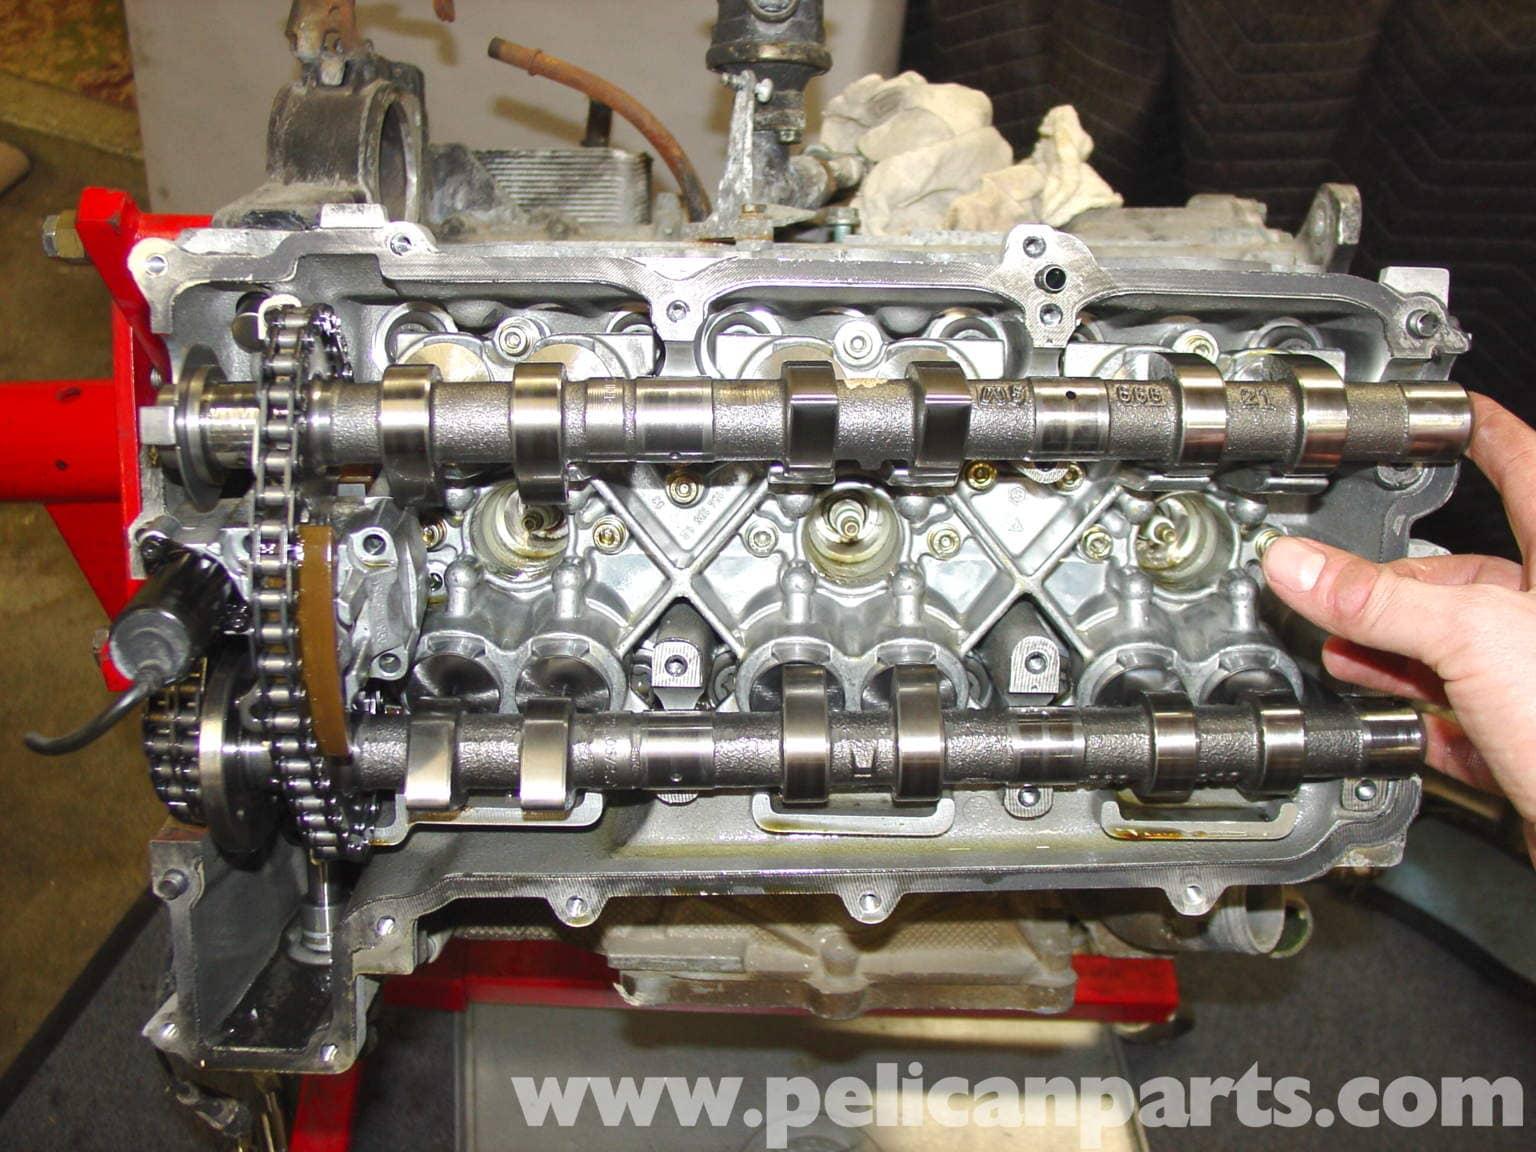 Porsche 911 Carrera Camshaft Swap And Valve Train Repair